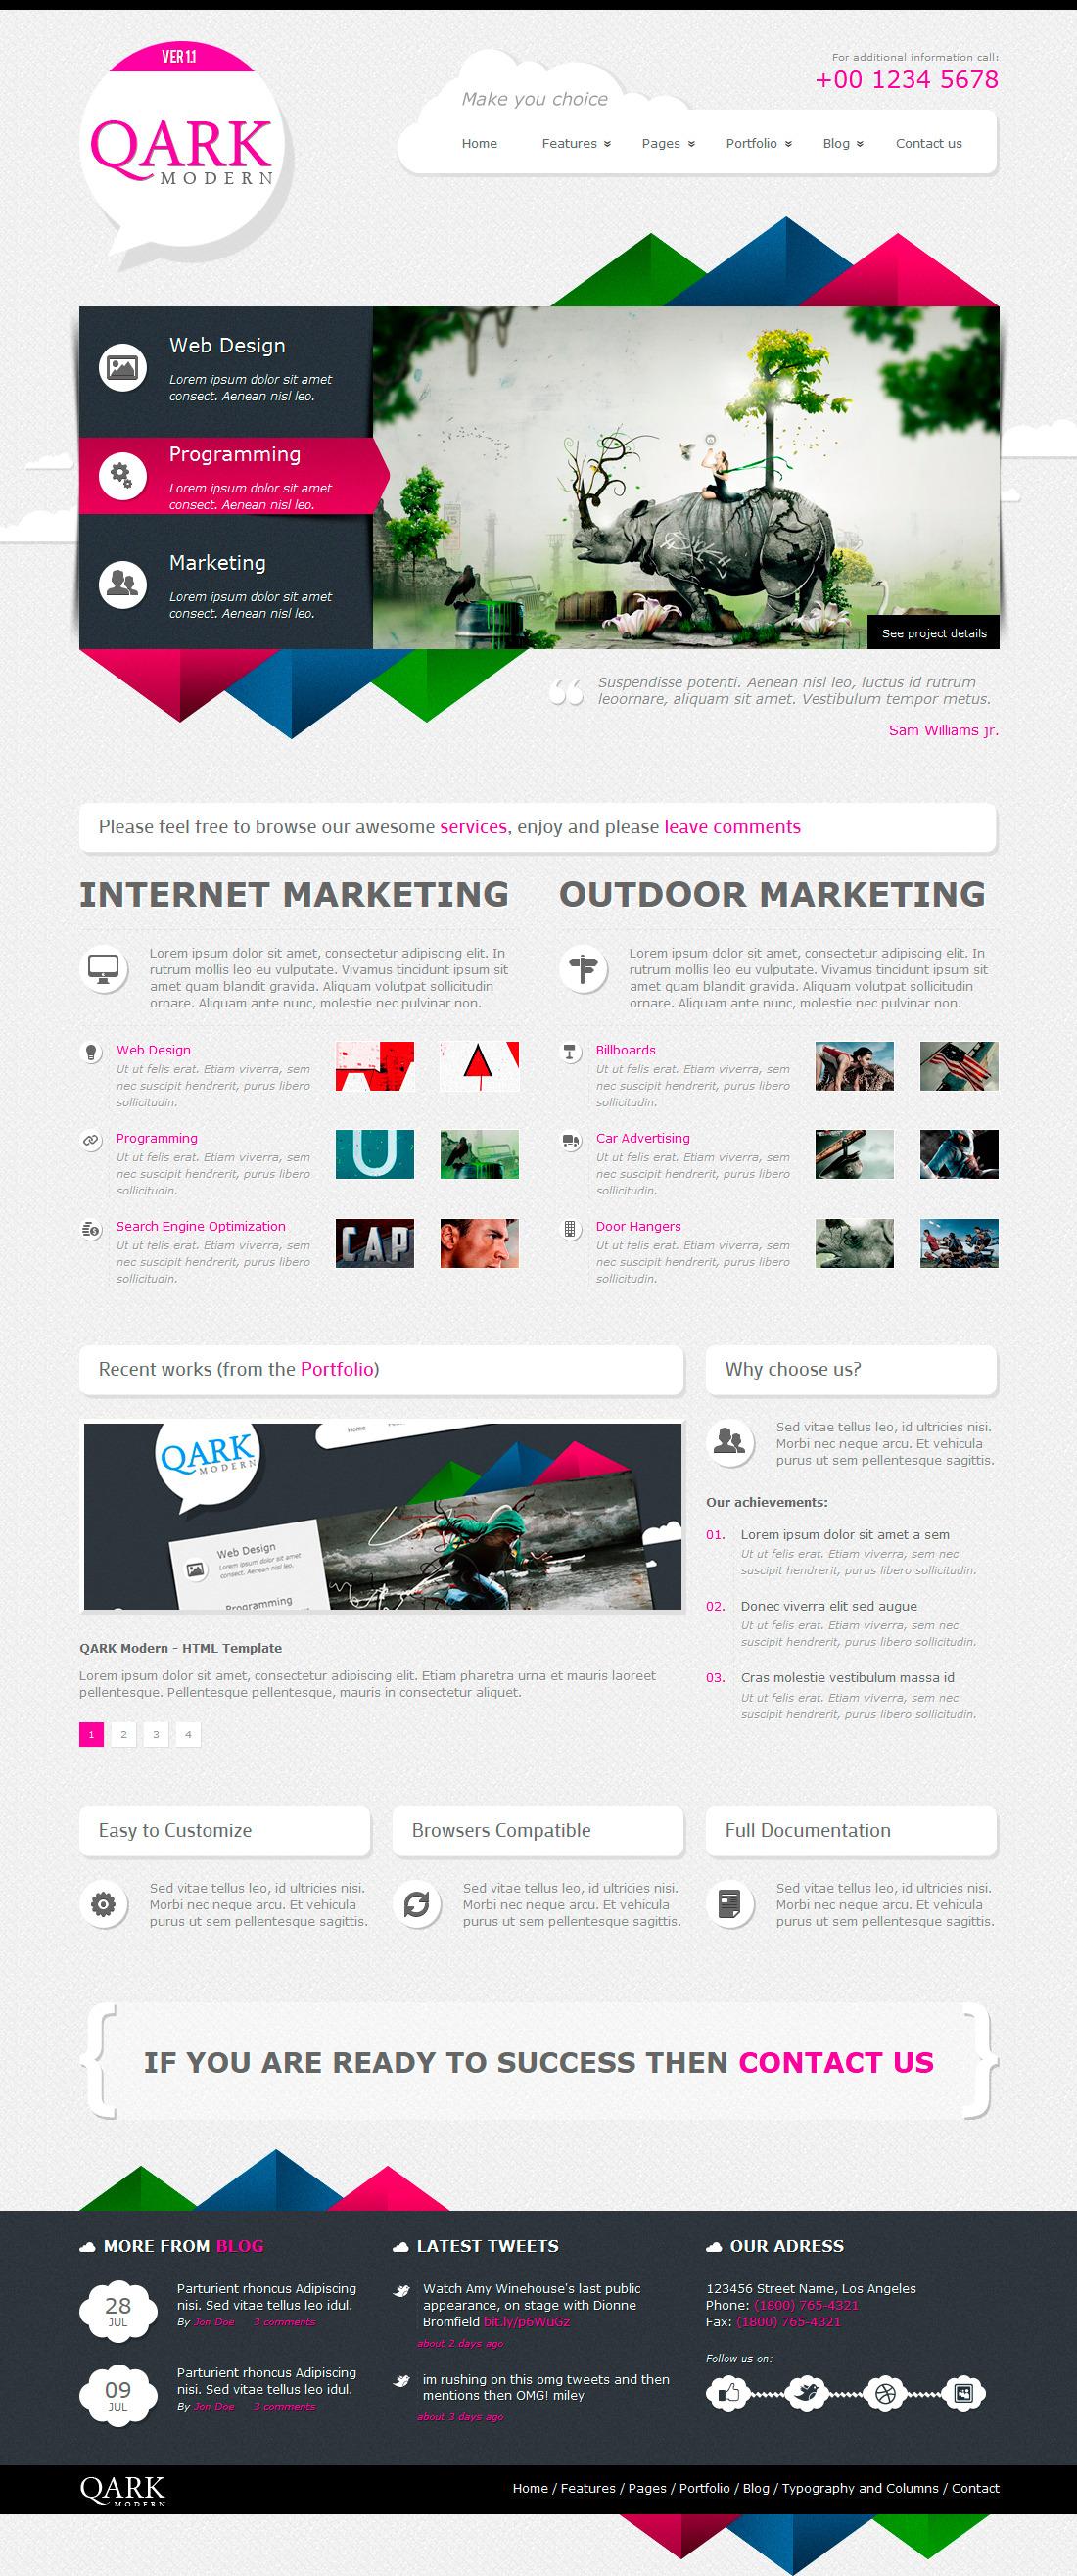 QARK Modern - HTML Template by OrangeIdea   ThemeForest